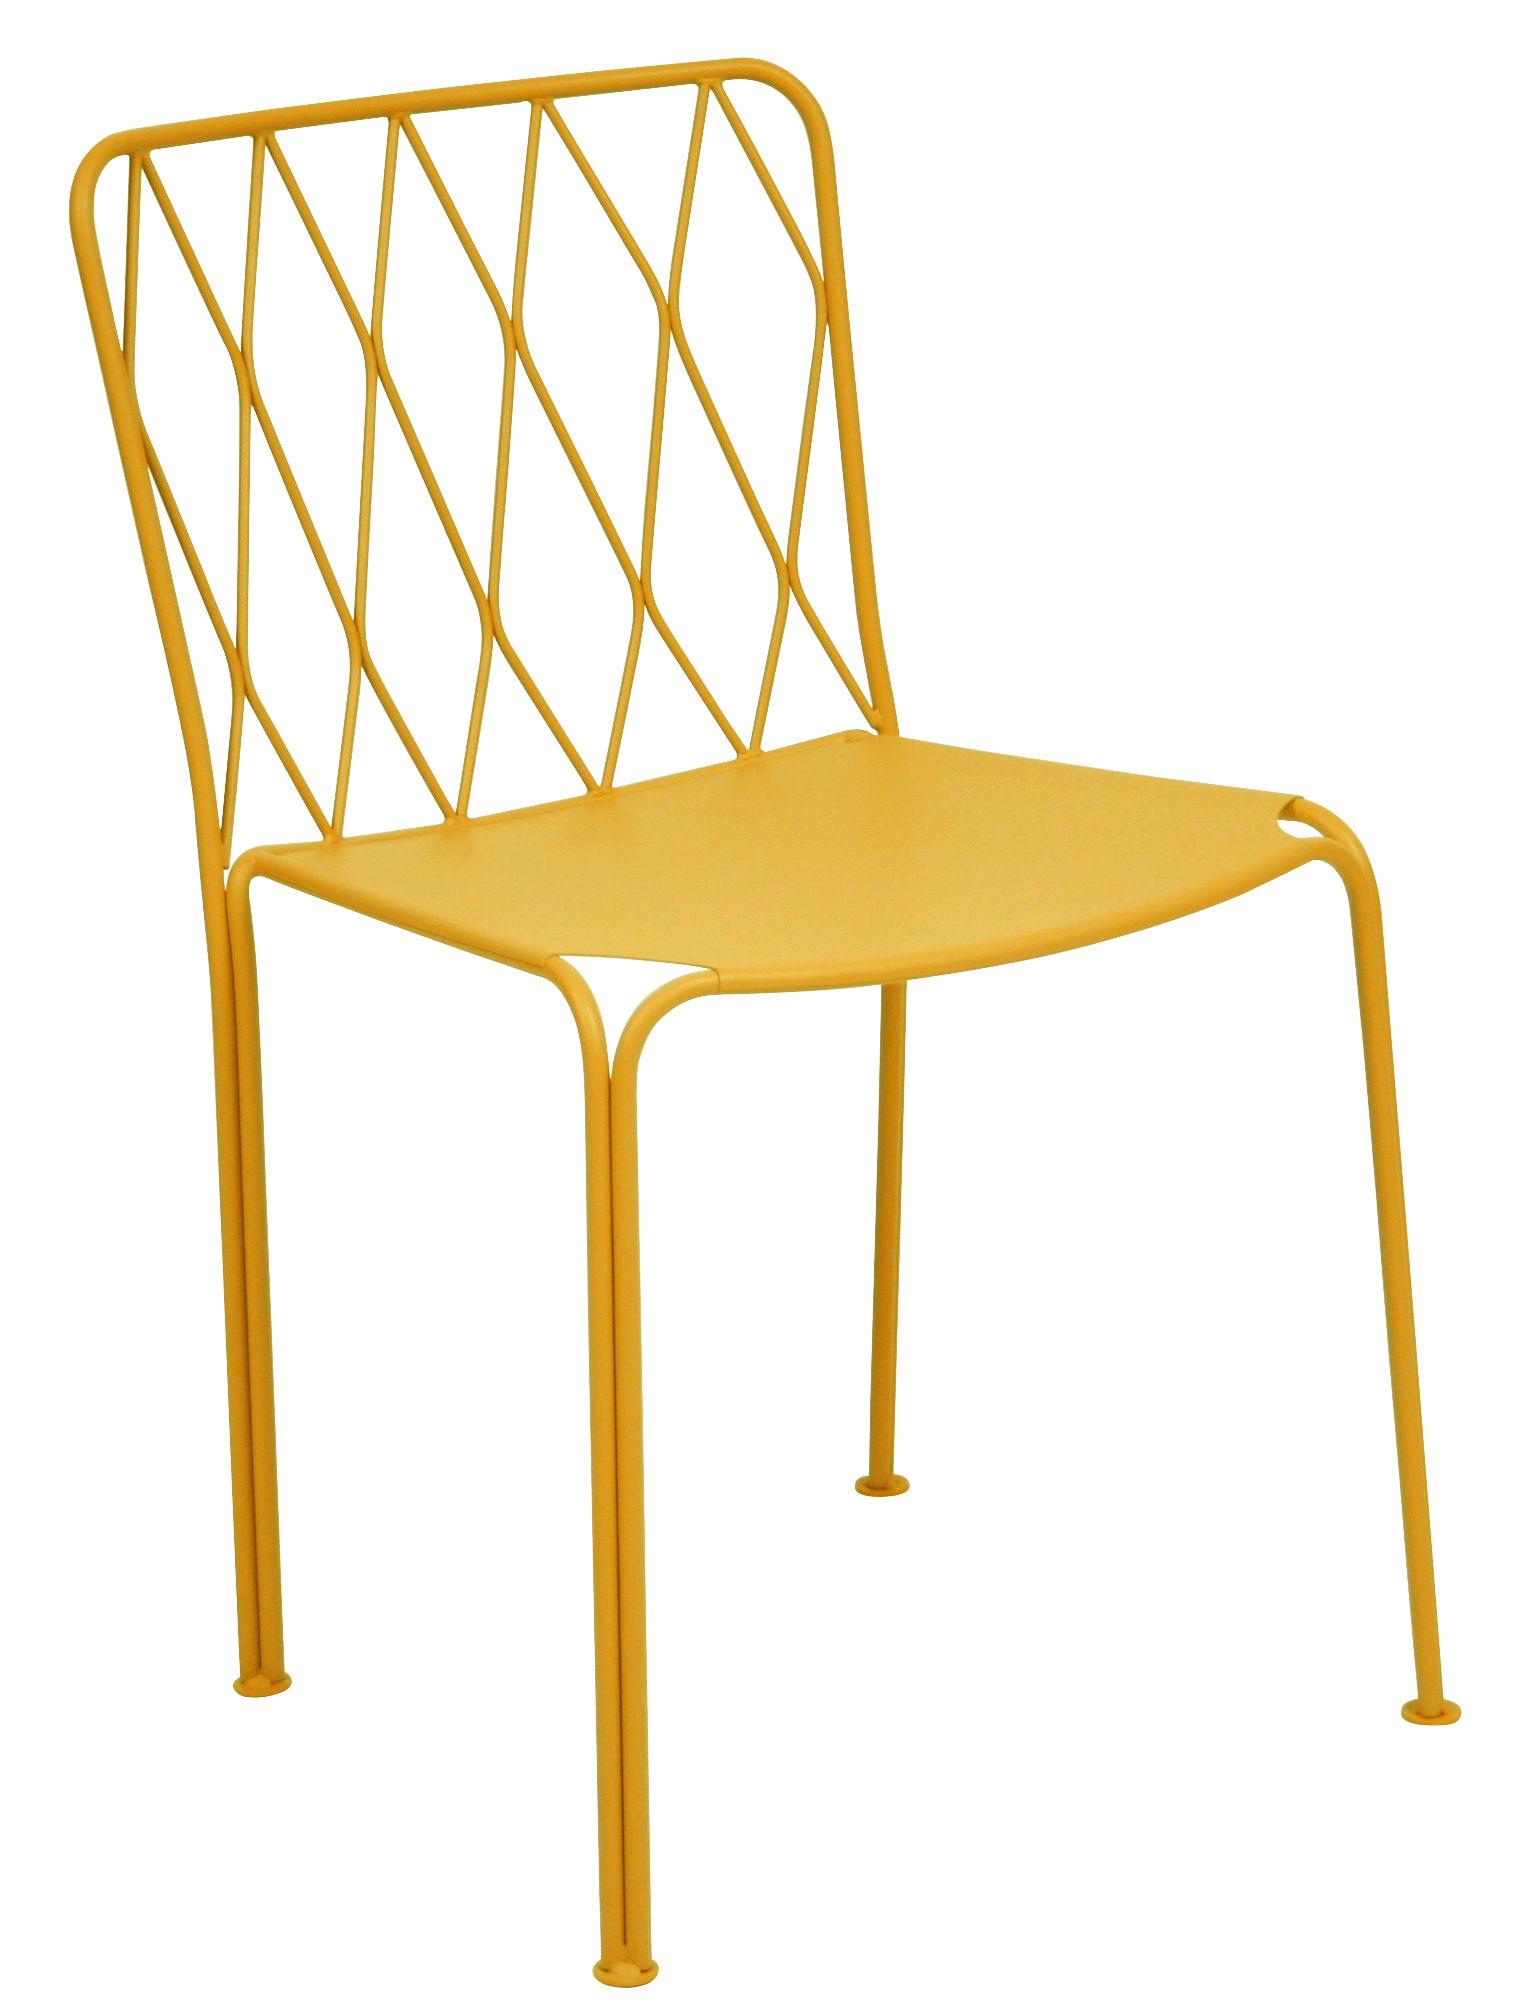 Furniture - Chairs - Kintbury Chair - Metal by Fermob - Honey - Painted steel